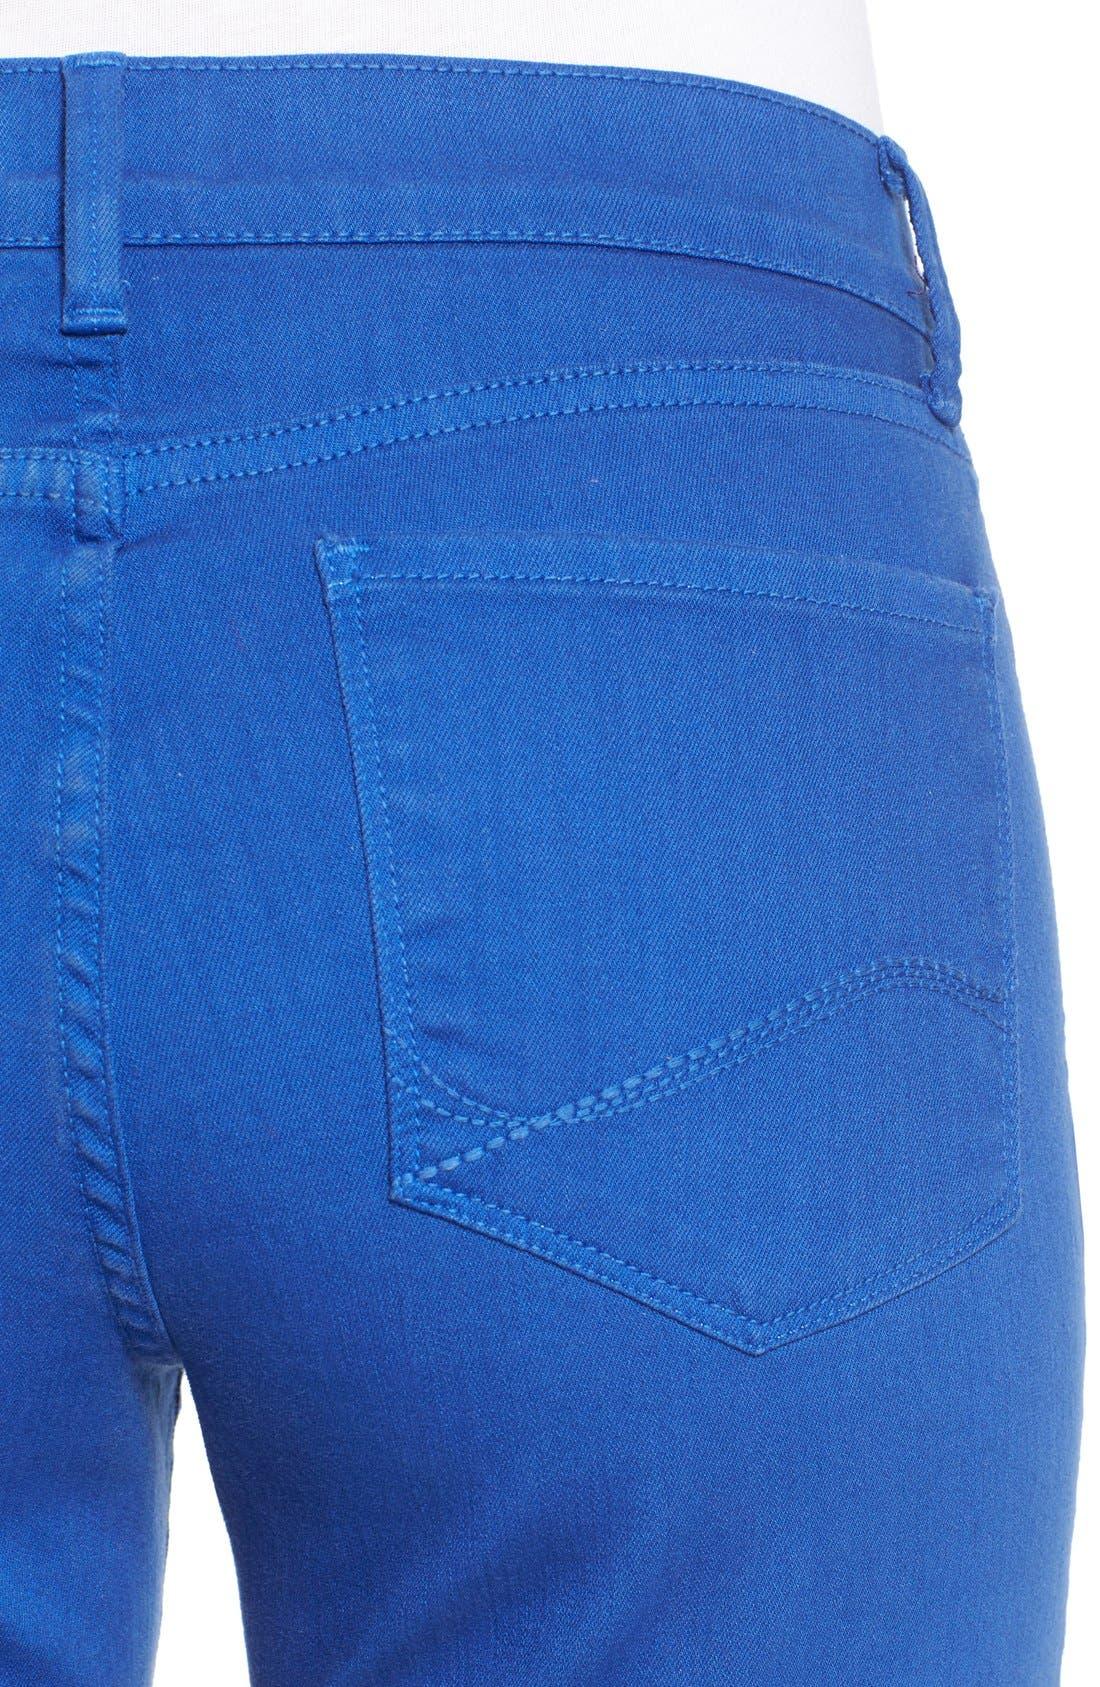 'Dayla' Colored Wide Cuff Capri Jeans,                             Alternate thumbnail 51, color,